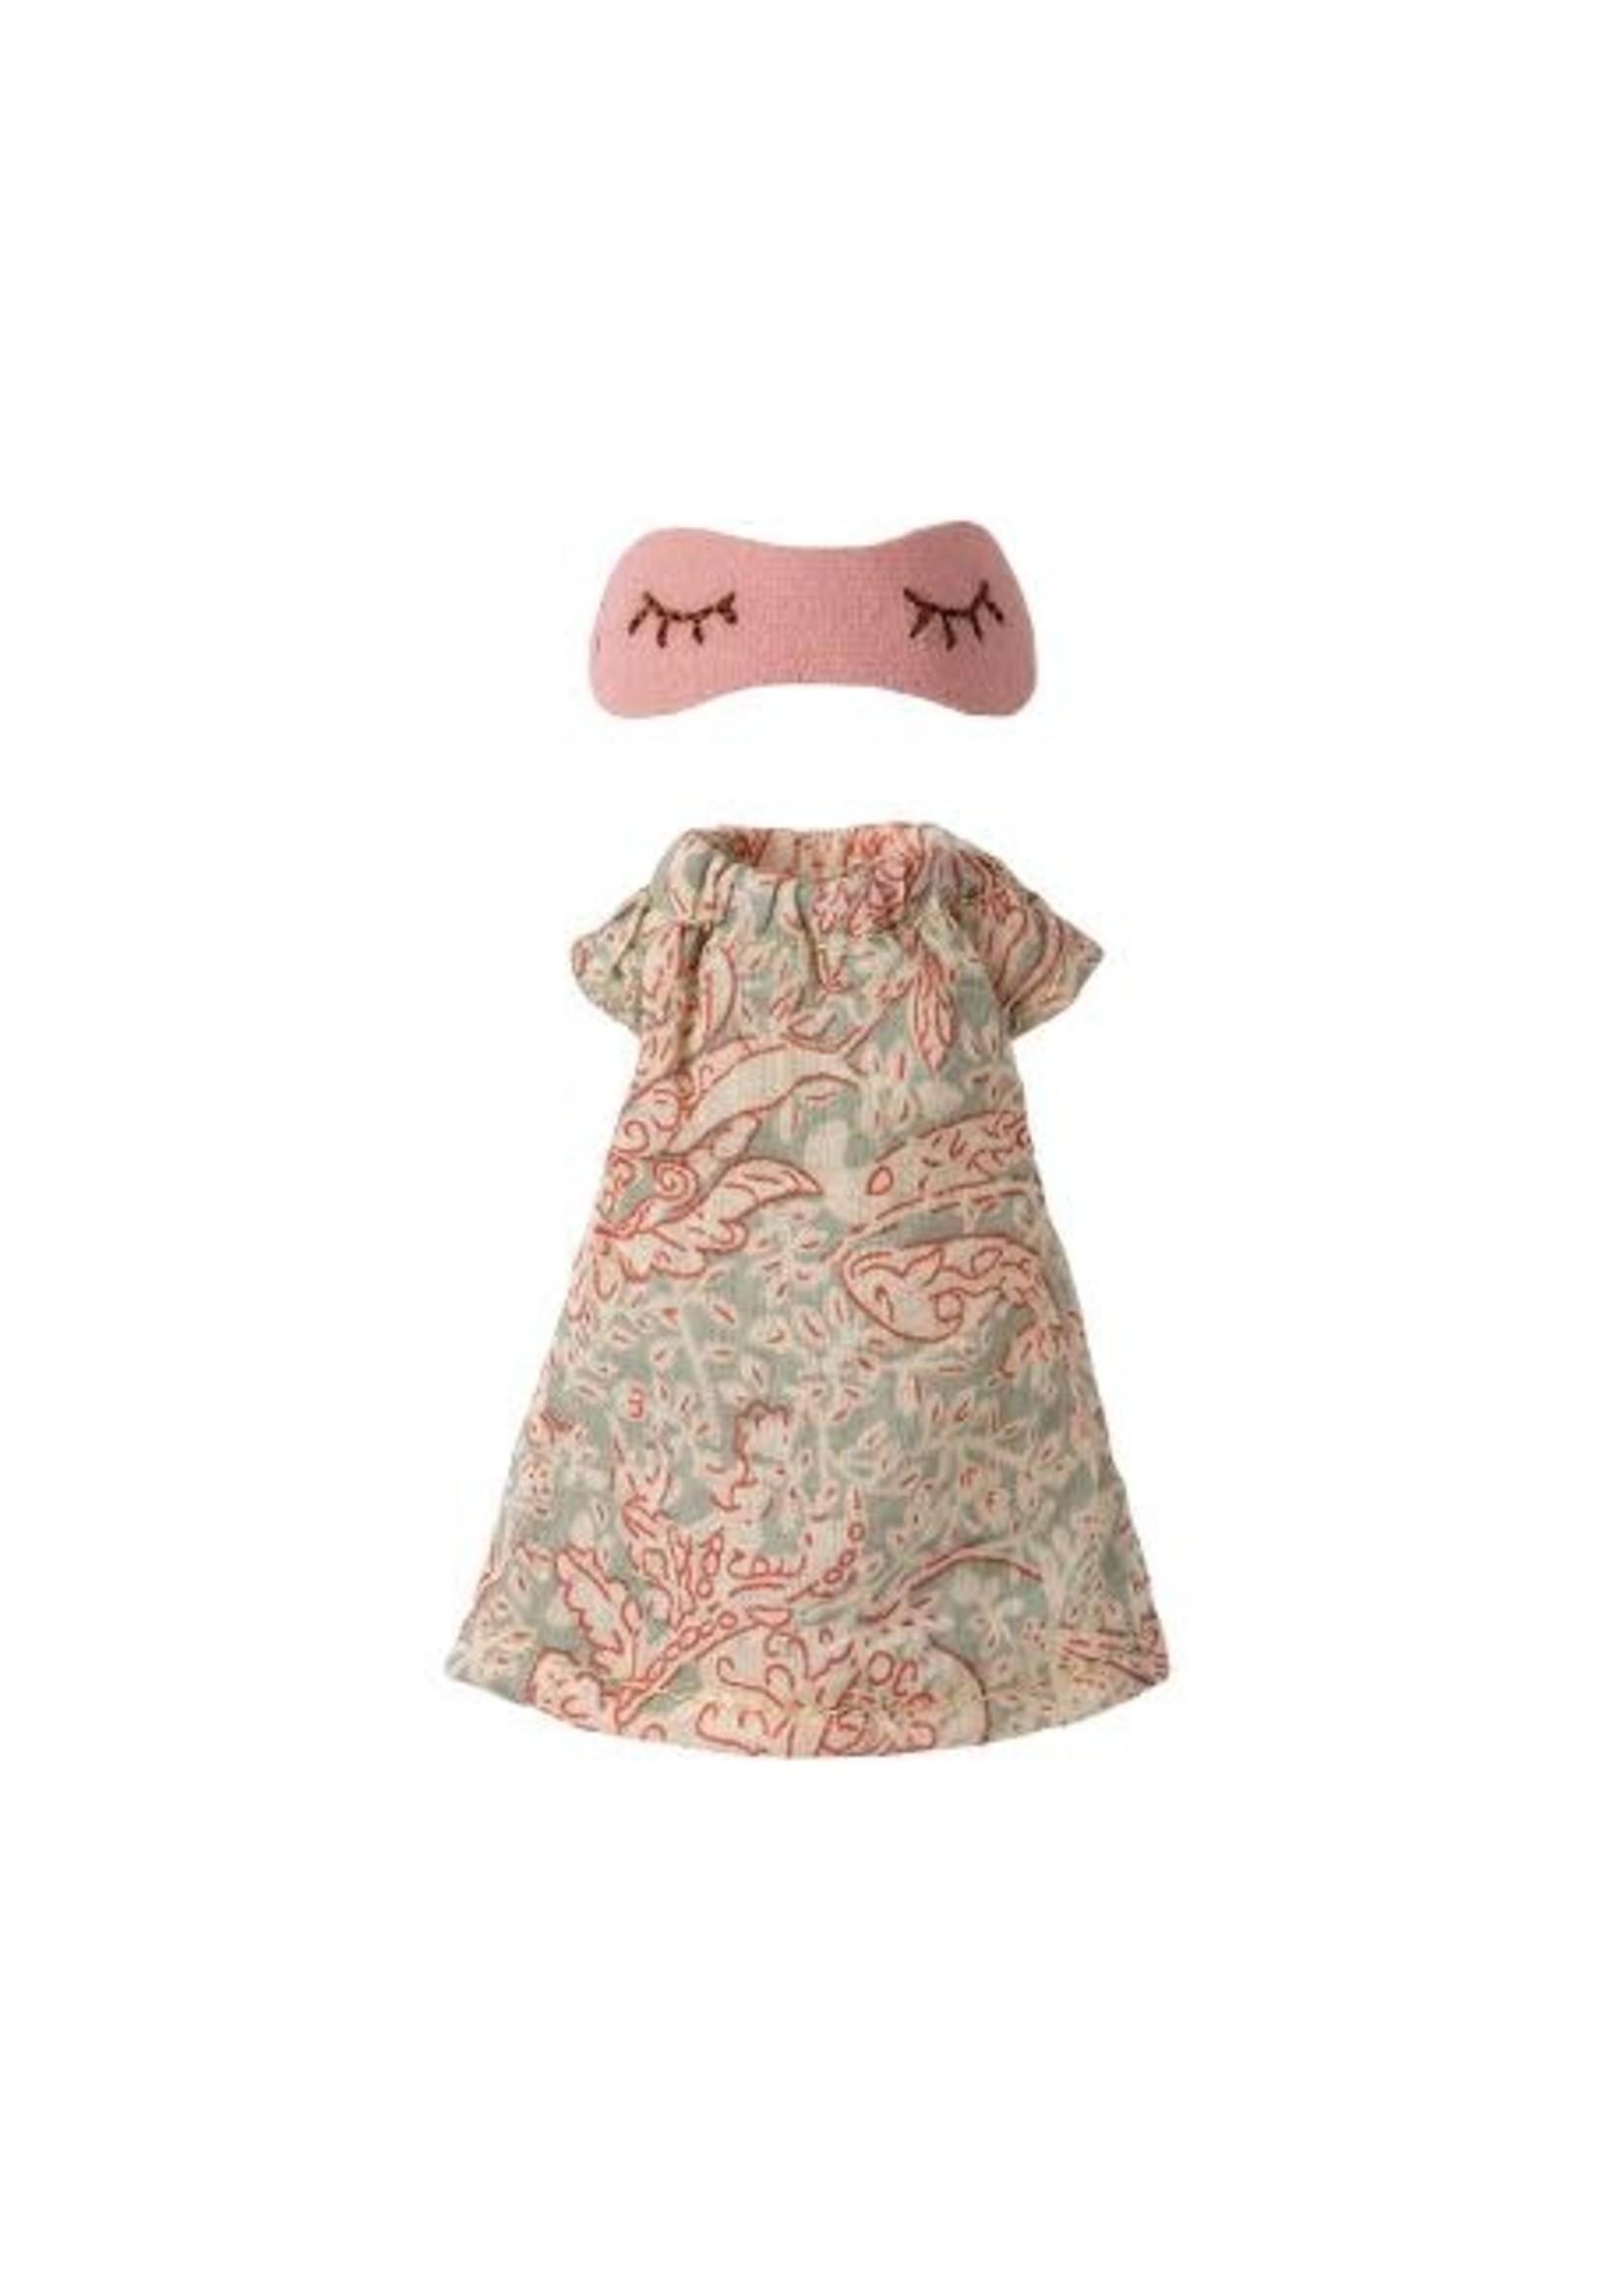 Maileg Mum & Dad Clothes - Nightgown for Mum